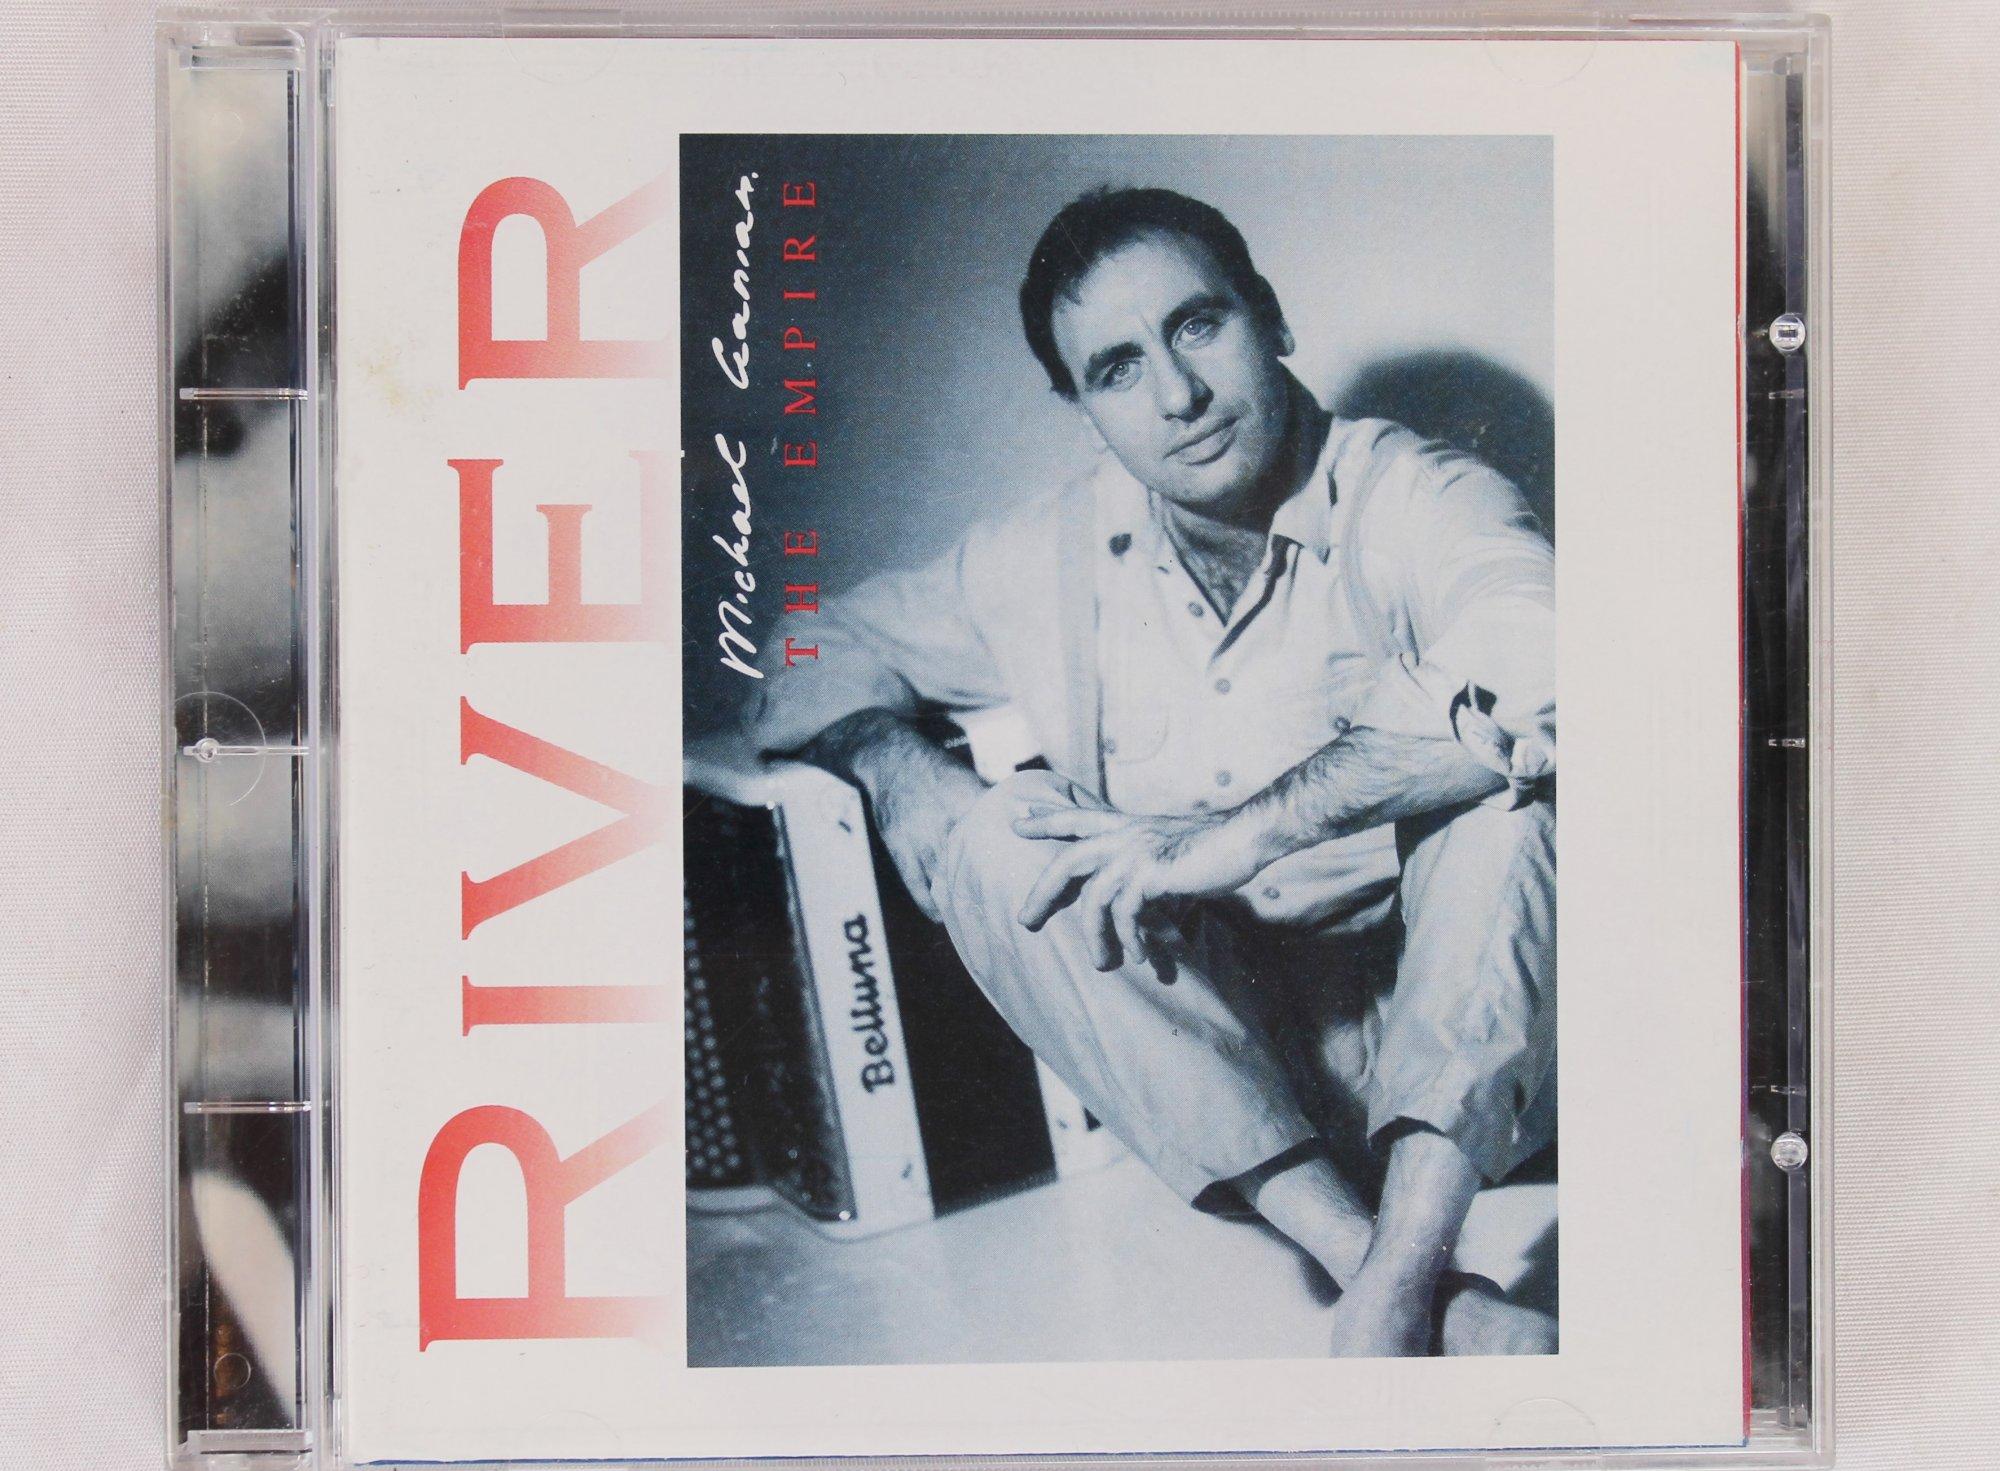 Michael Ganian: River (CD)